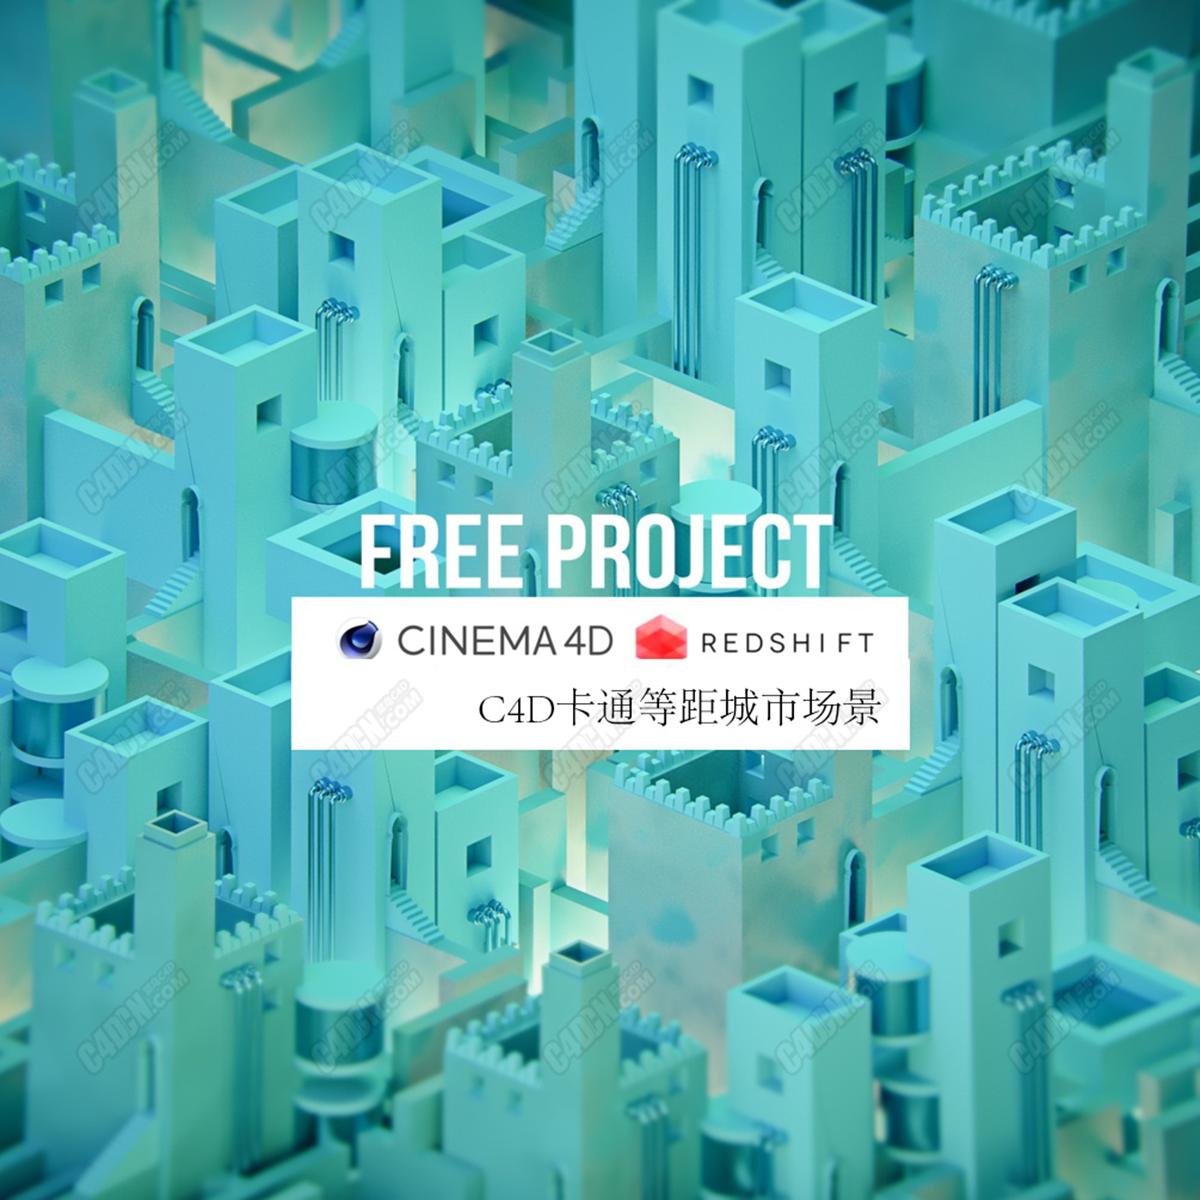 C4D卡通等距城市场景模型素材 isometric city